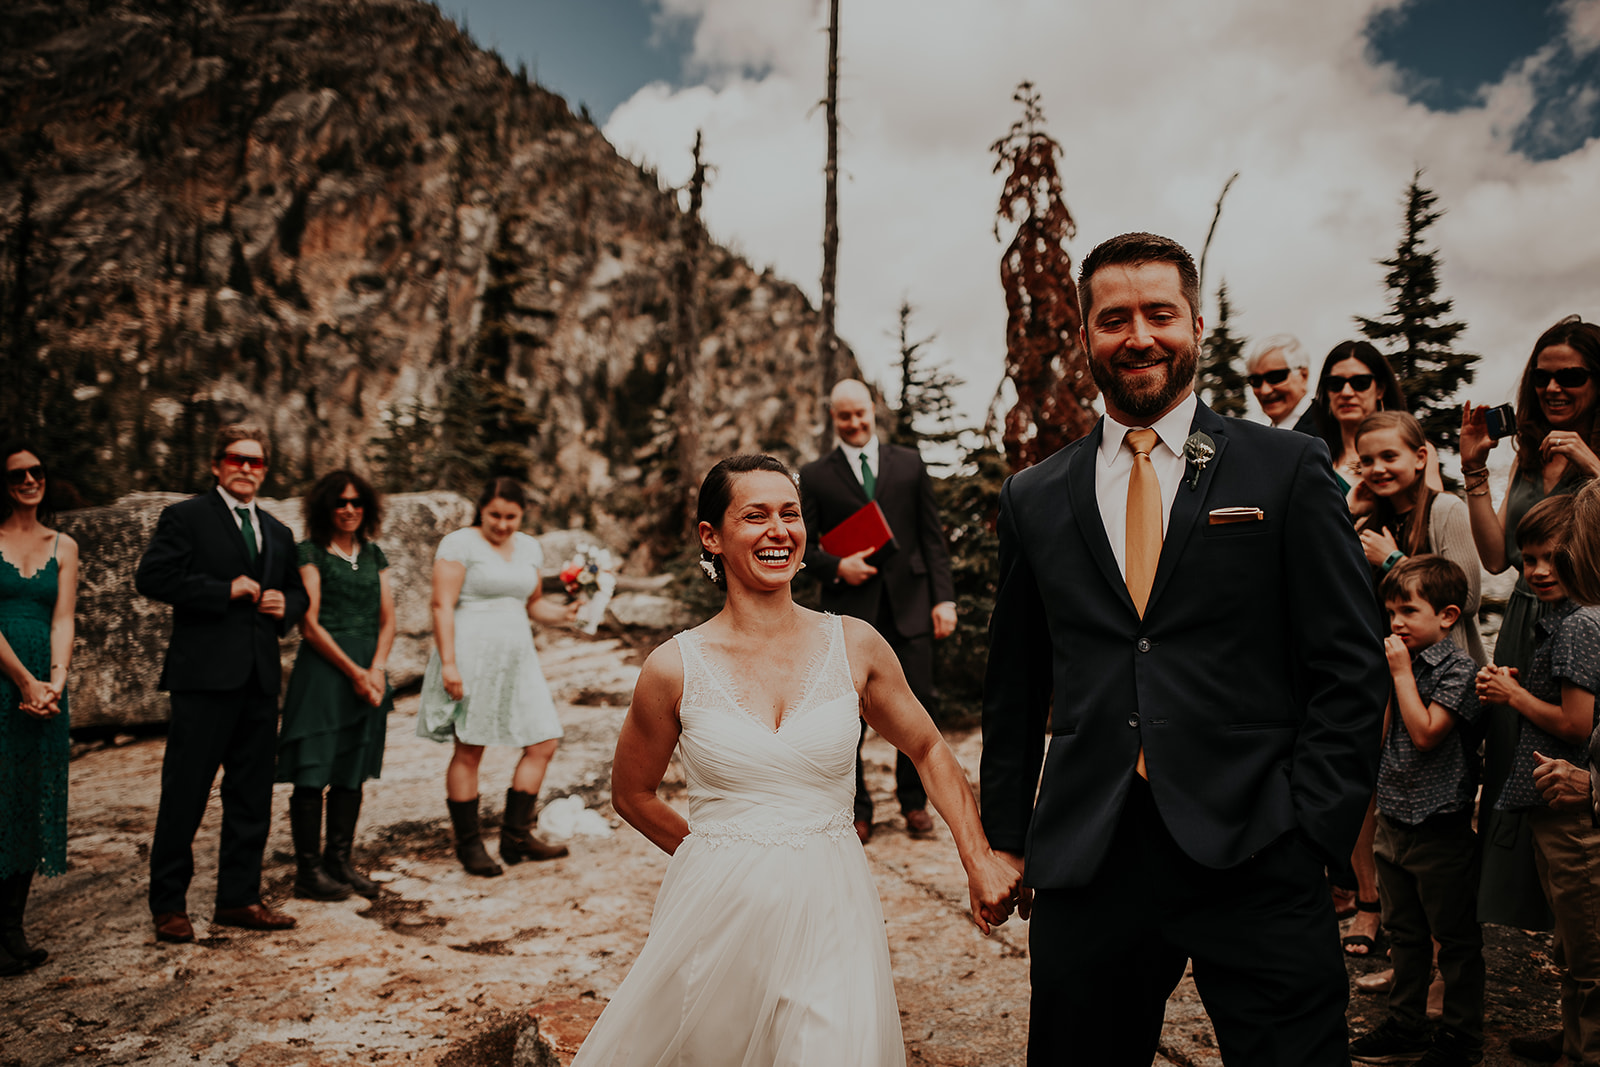 winthrop-wedding-photographer-megan-gallagher-photography (20).jpg